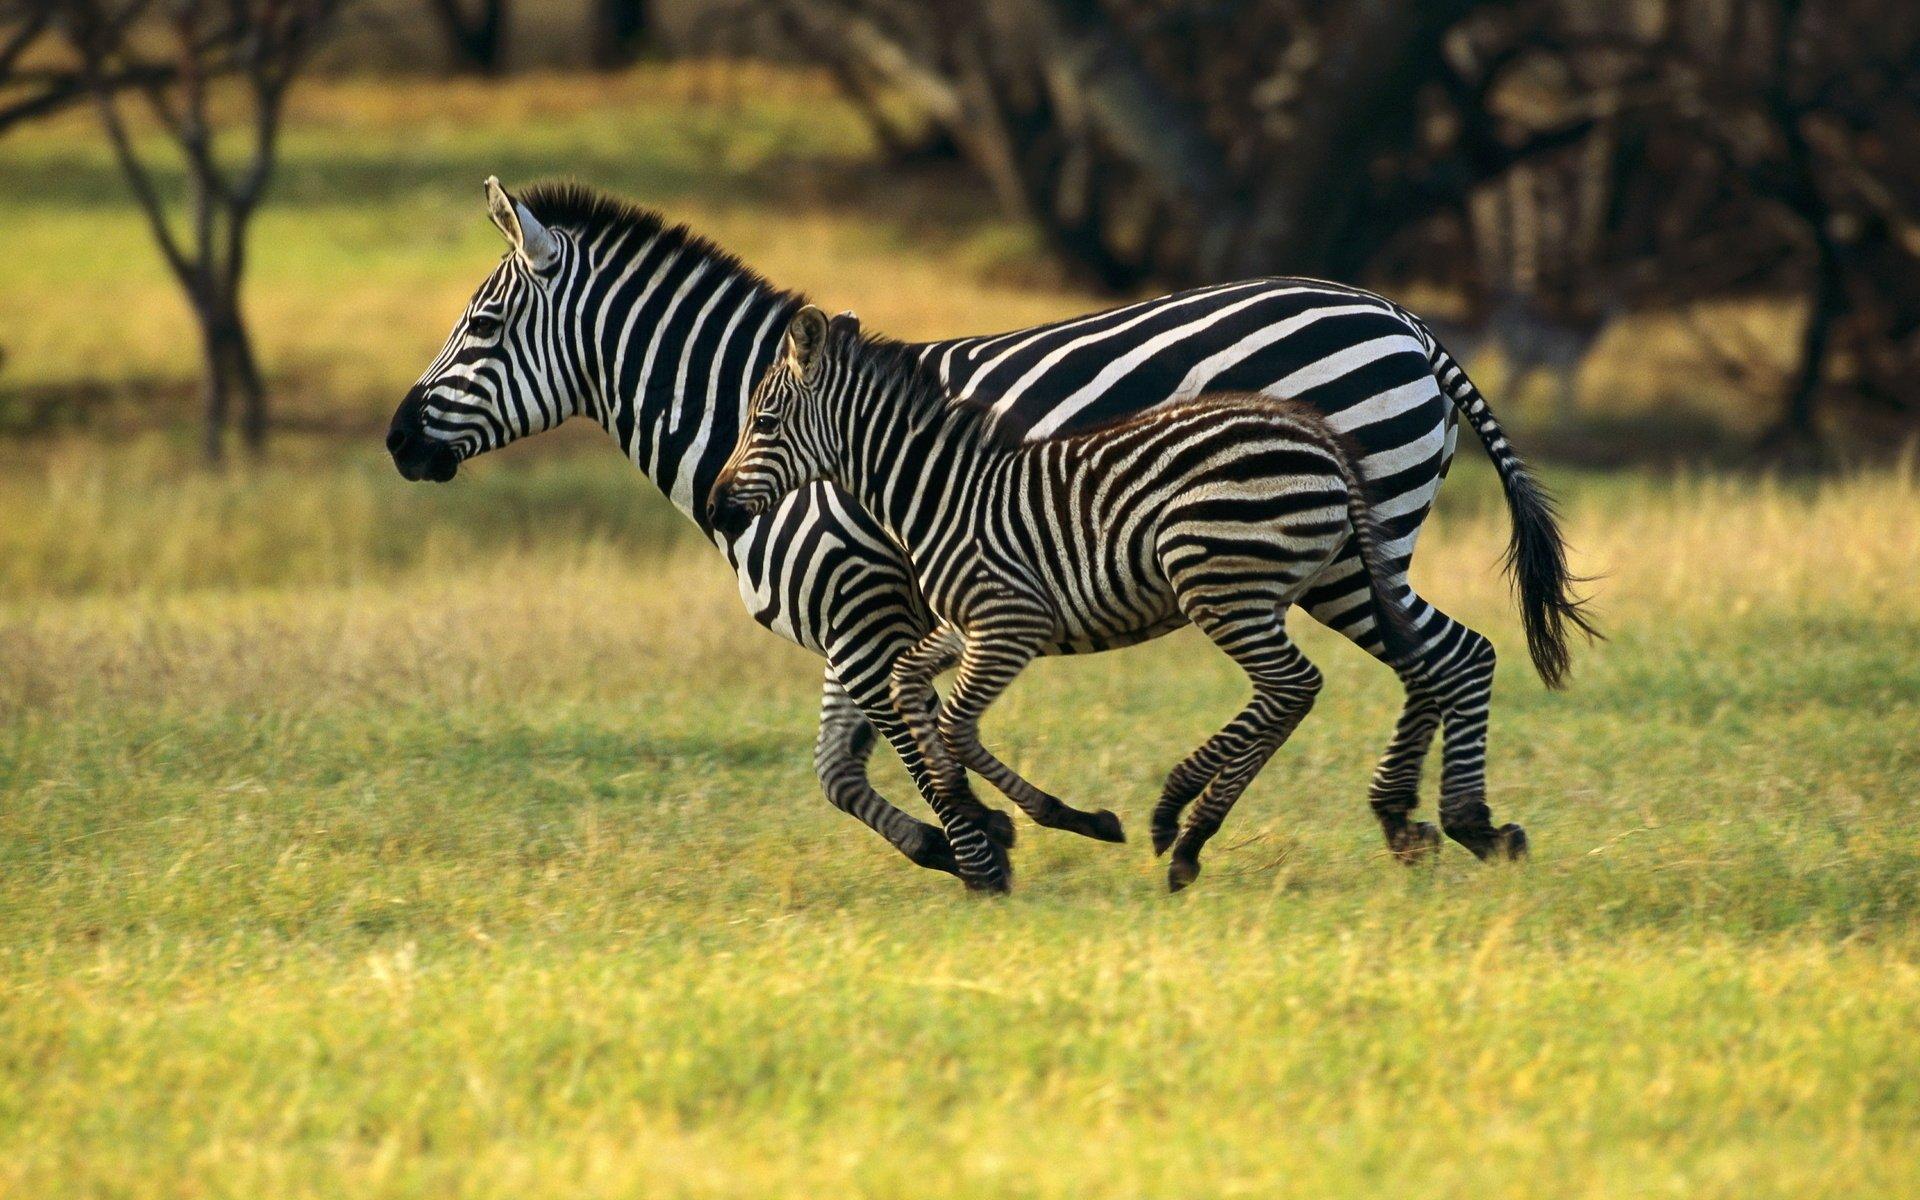 running Zebra Wallpaper